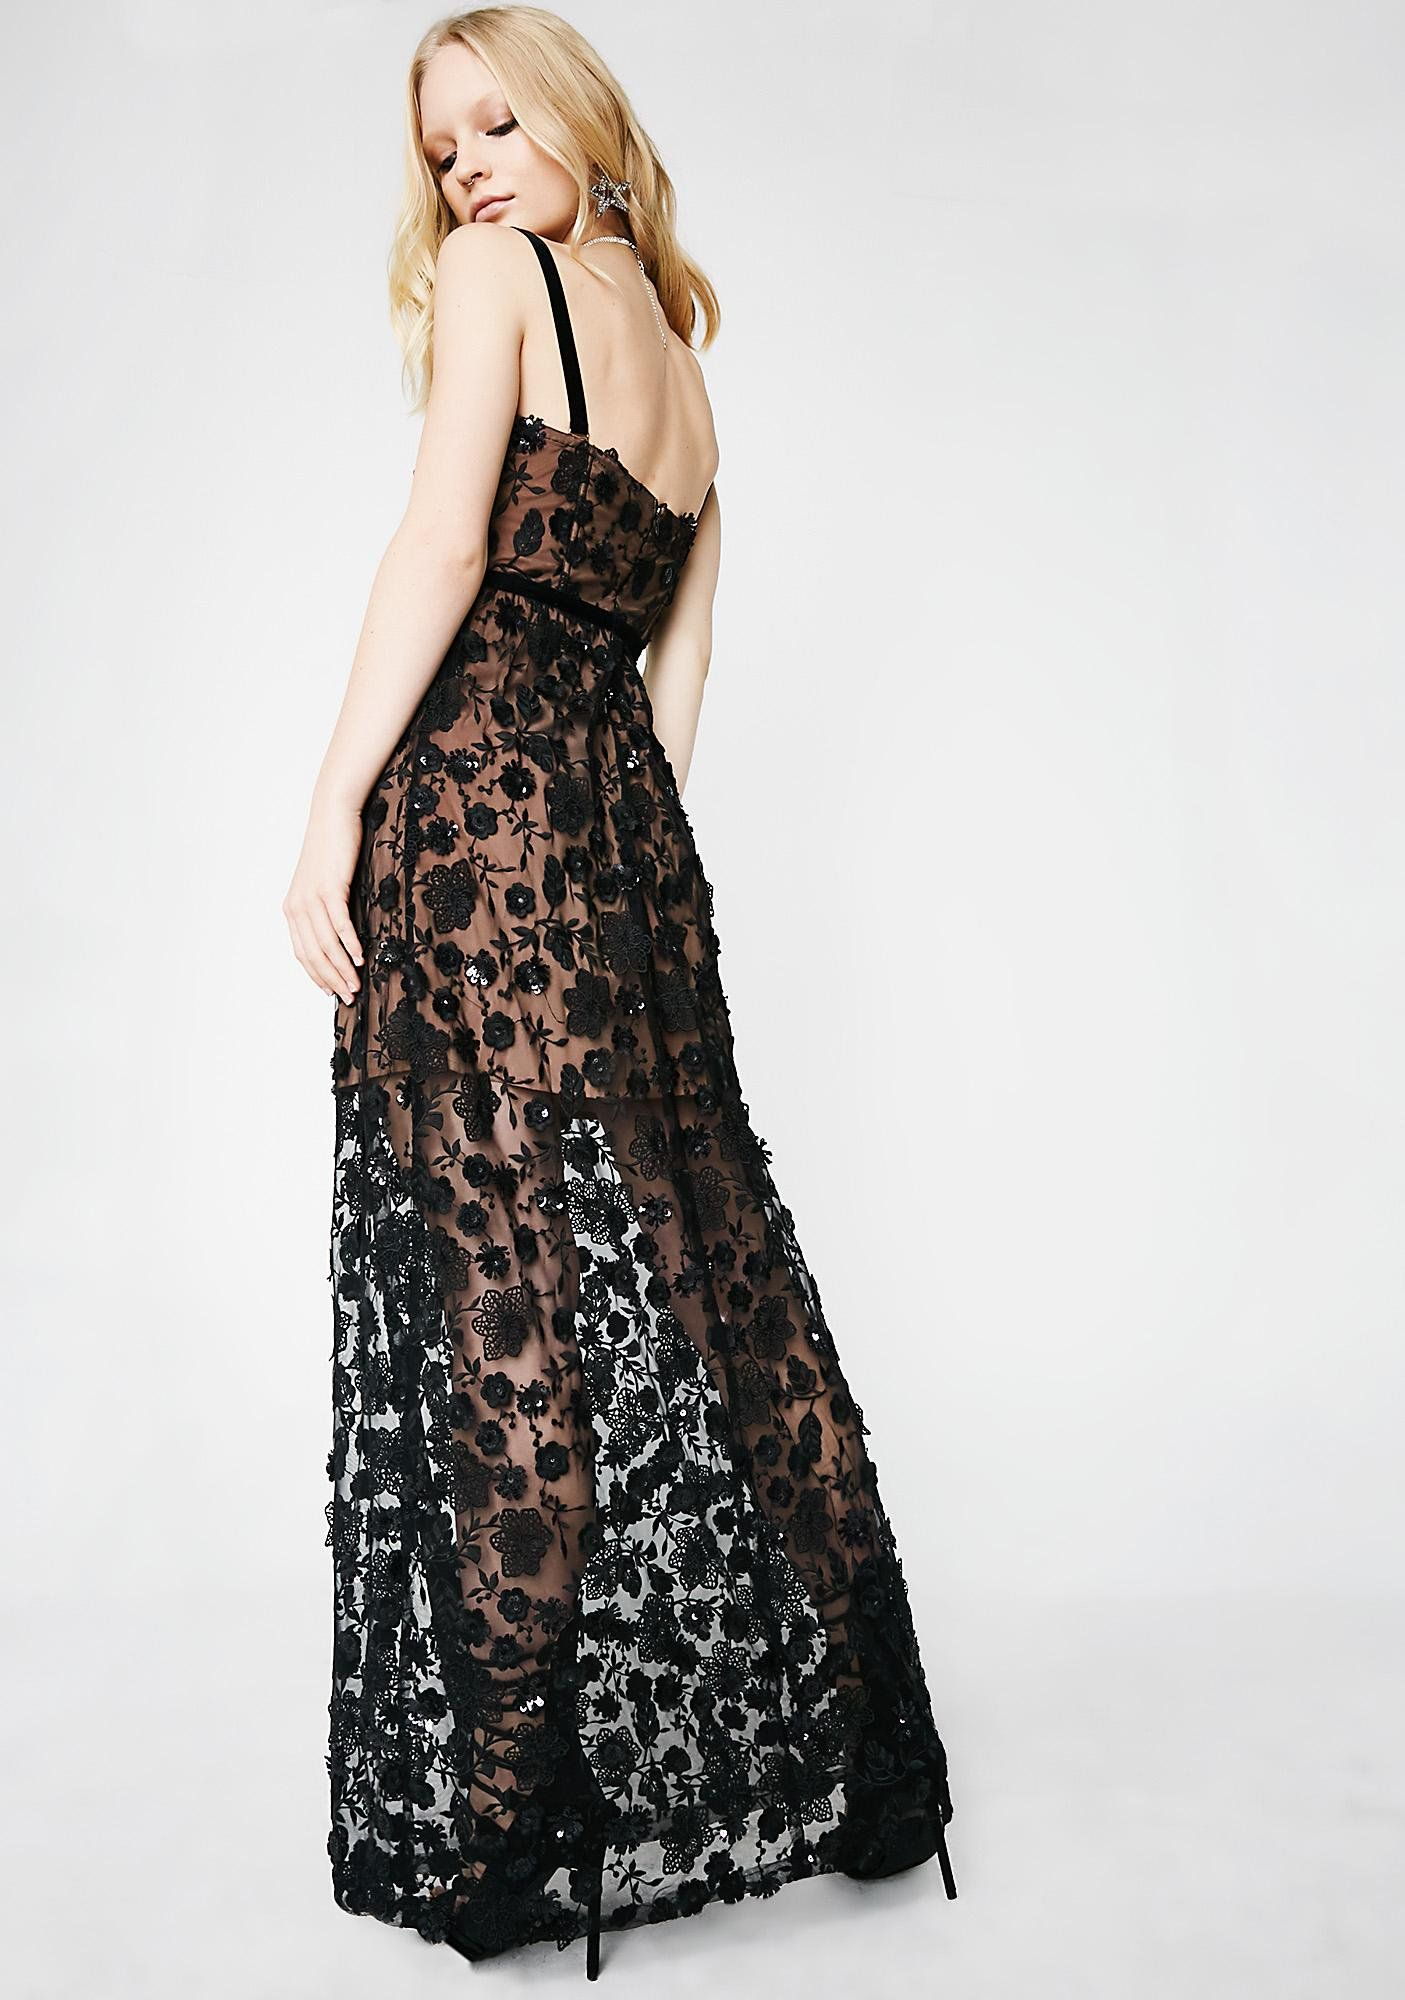 523dd433290 Dark Beatrice Strappy Maxi Dress | 2018 looks | Strappy maxi dress ...